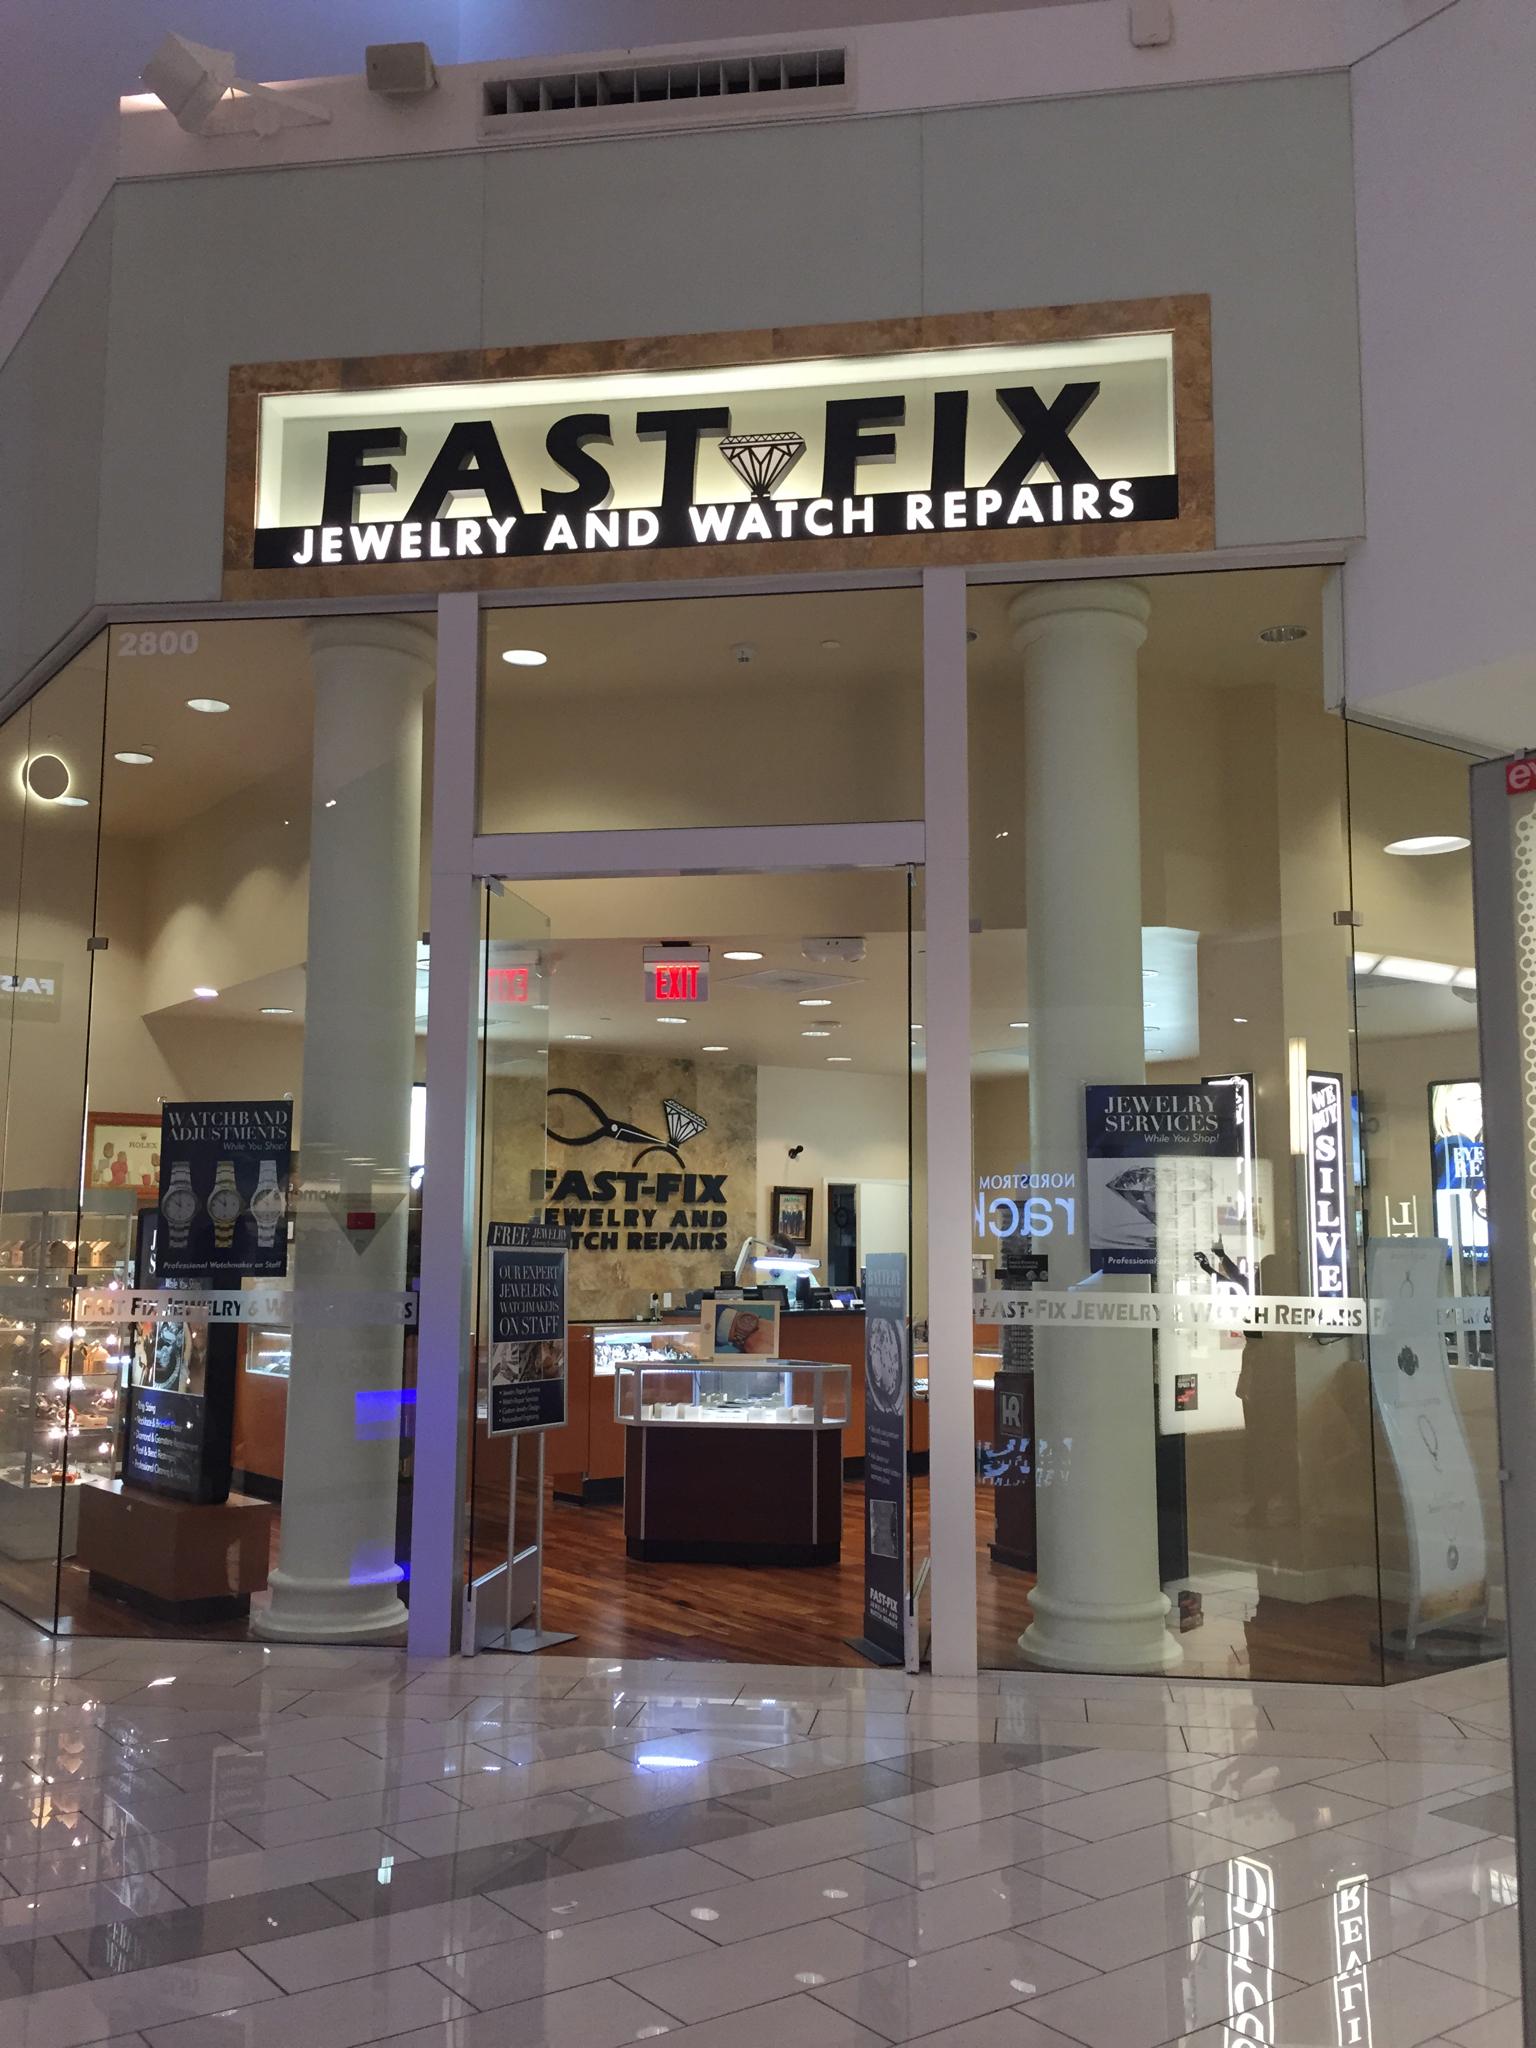 eedd19653 Fast Fix Jewelry and Watch Repairs 6000 Sepulveda Blvd, Culver City, CA  90230 - YP.com